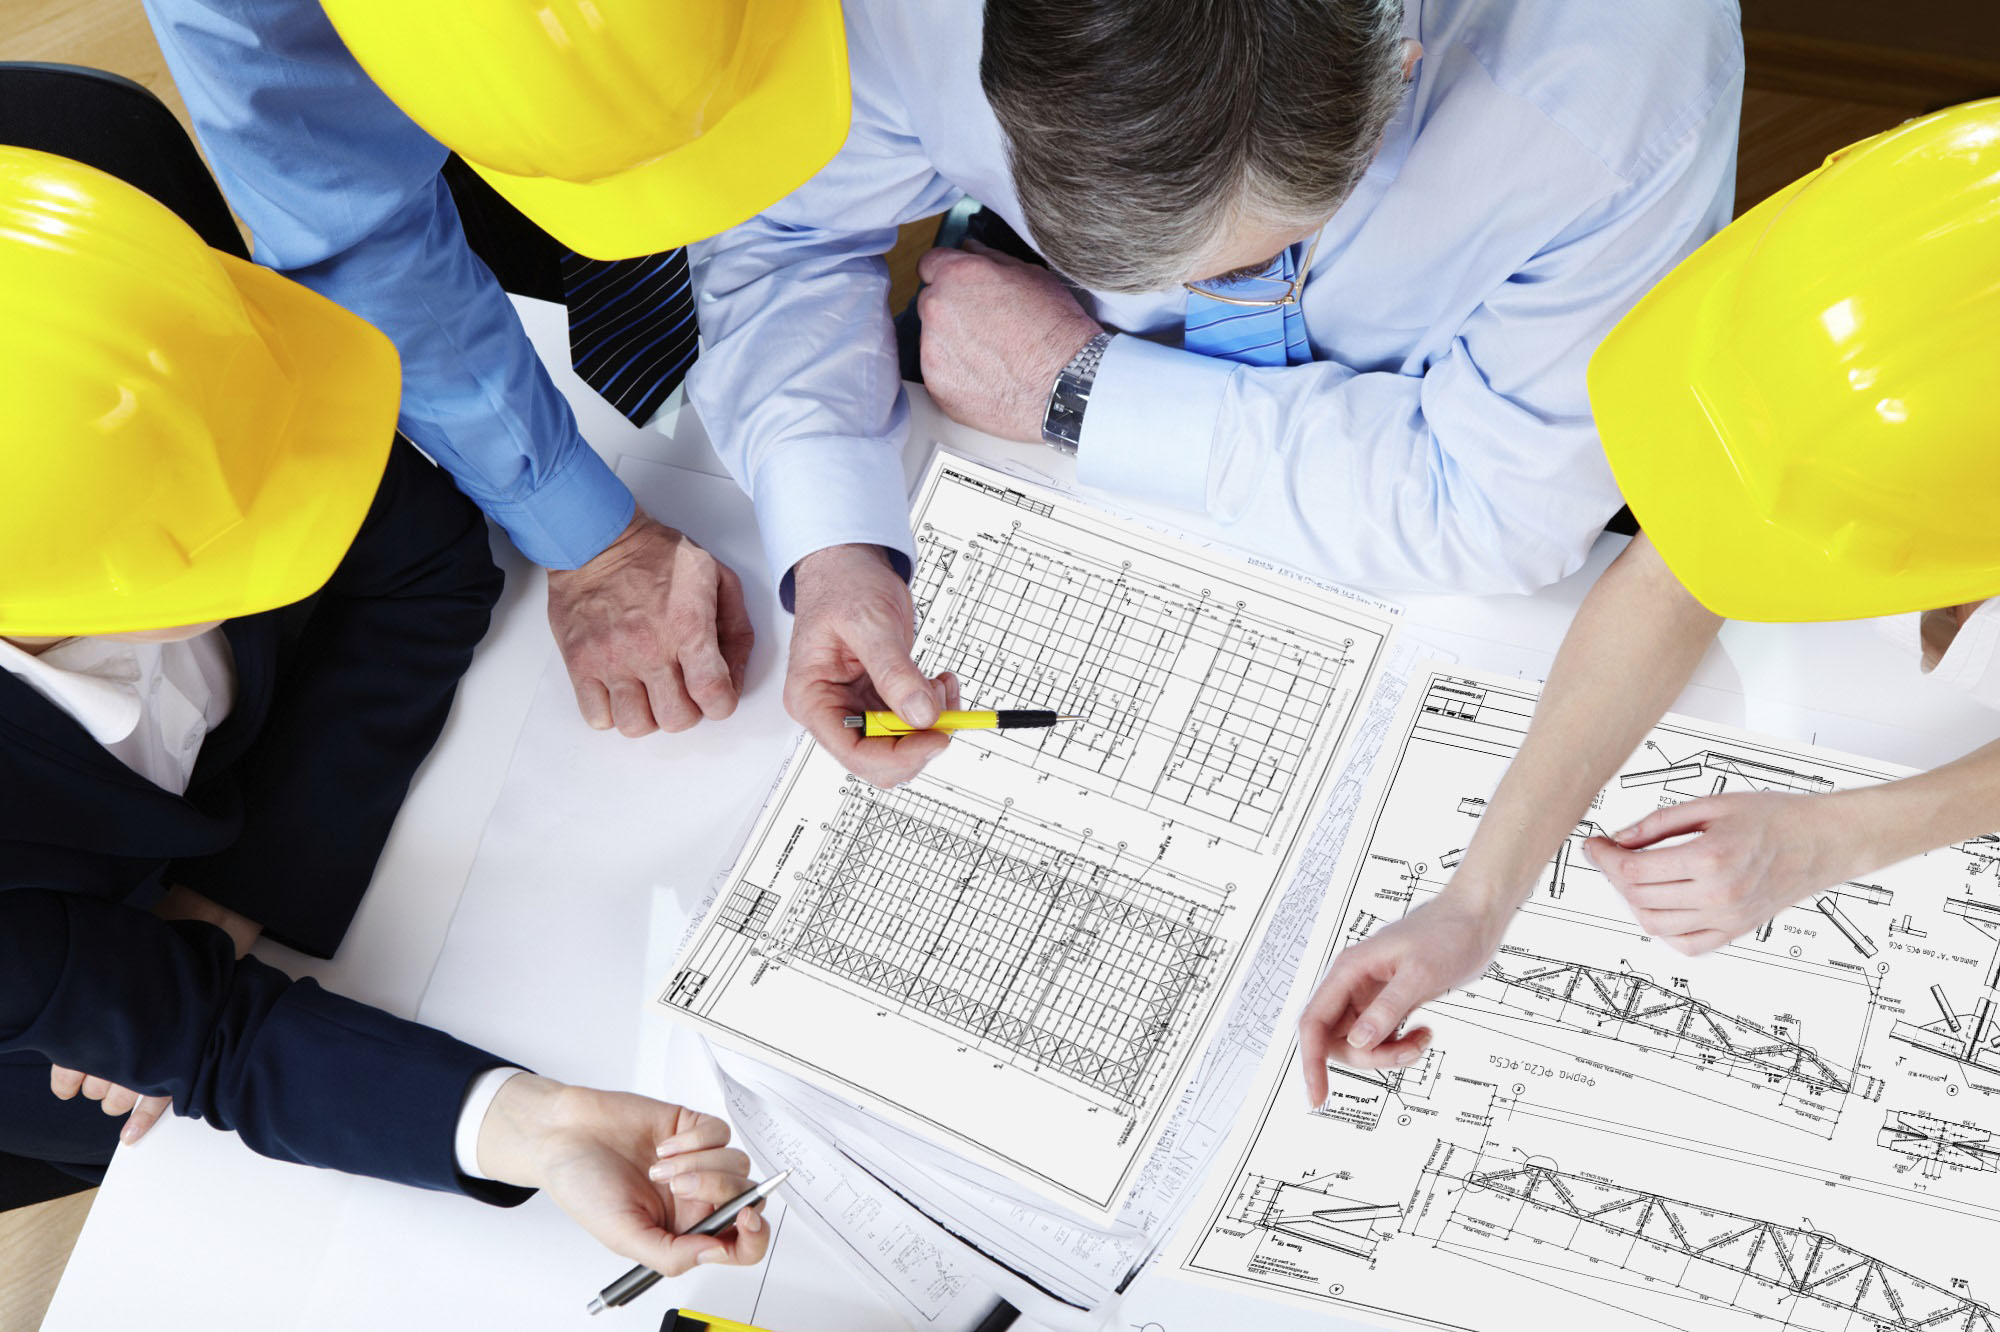 engineering-construction-crew2_1